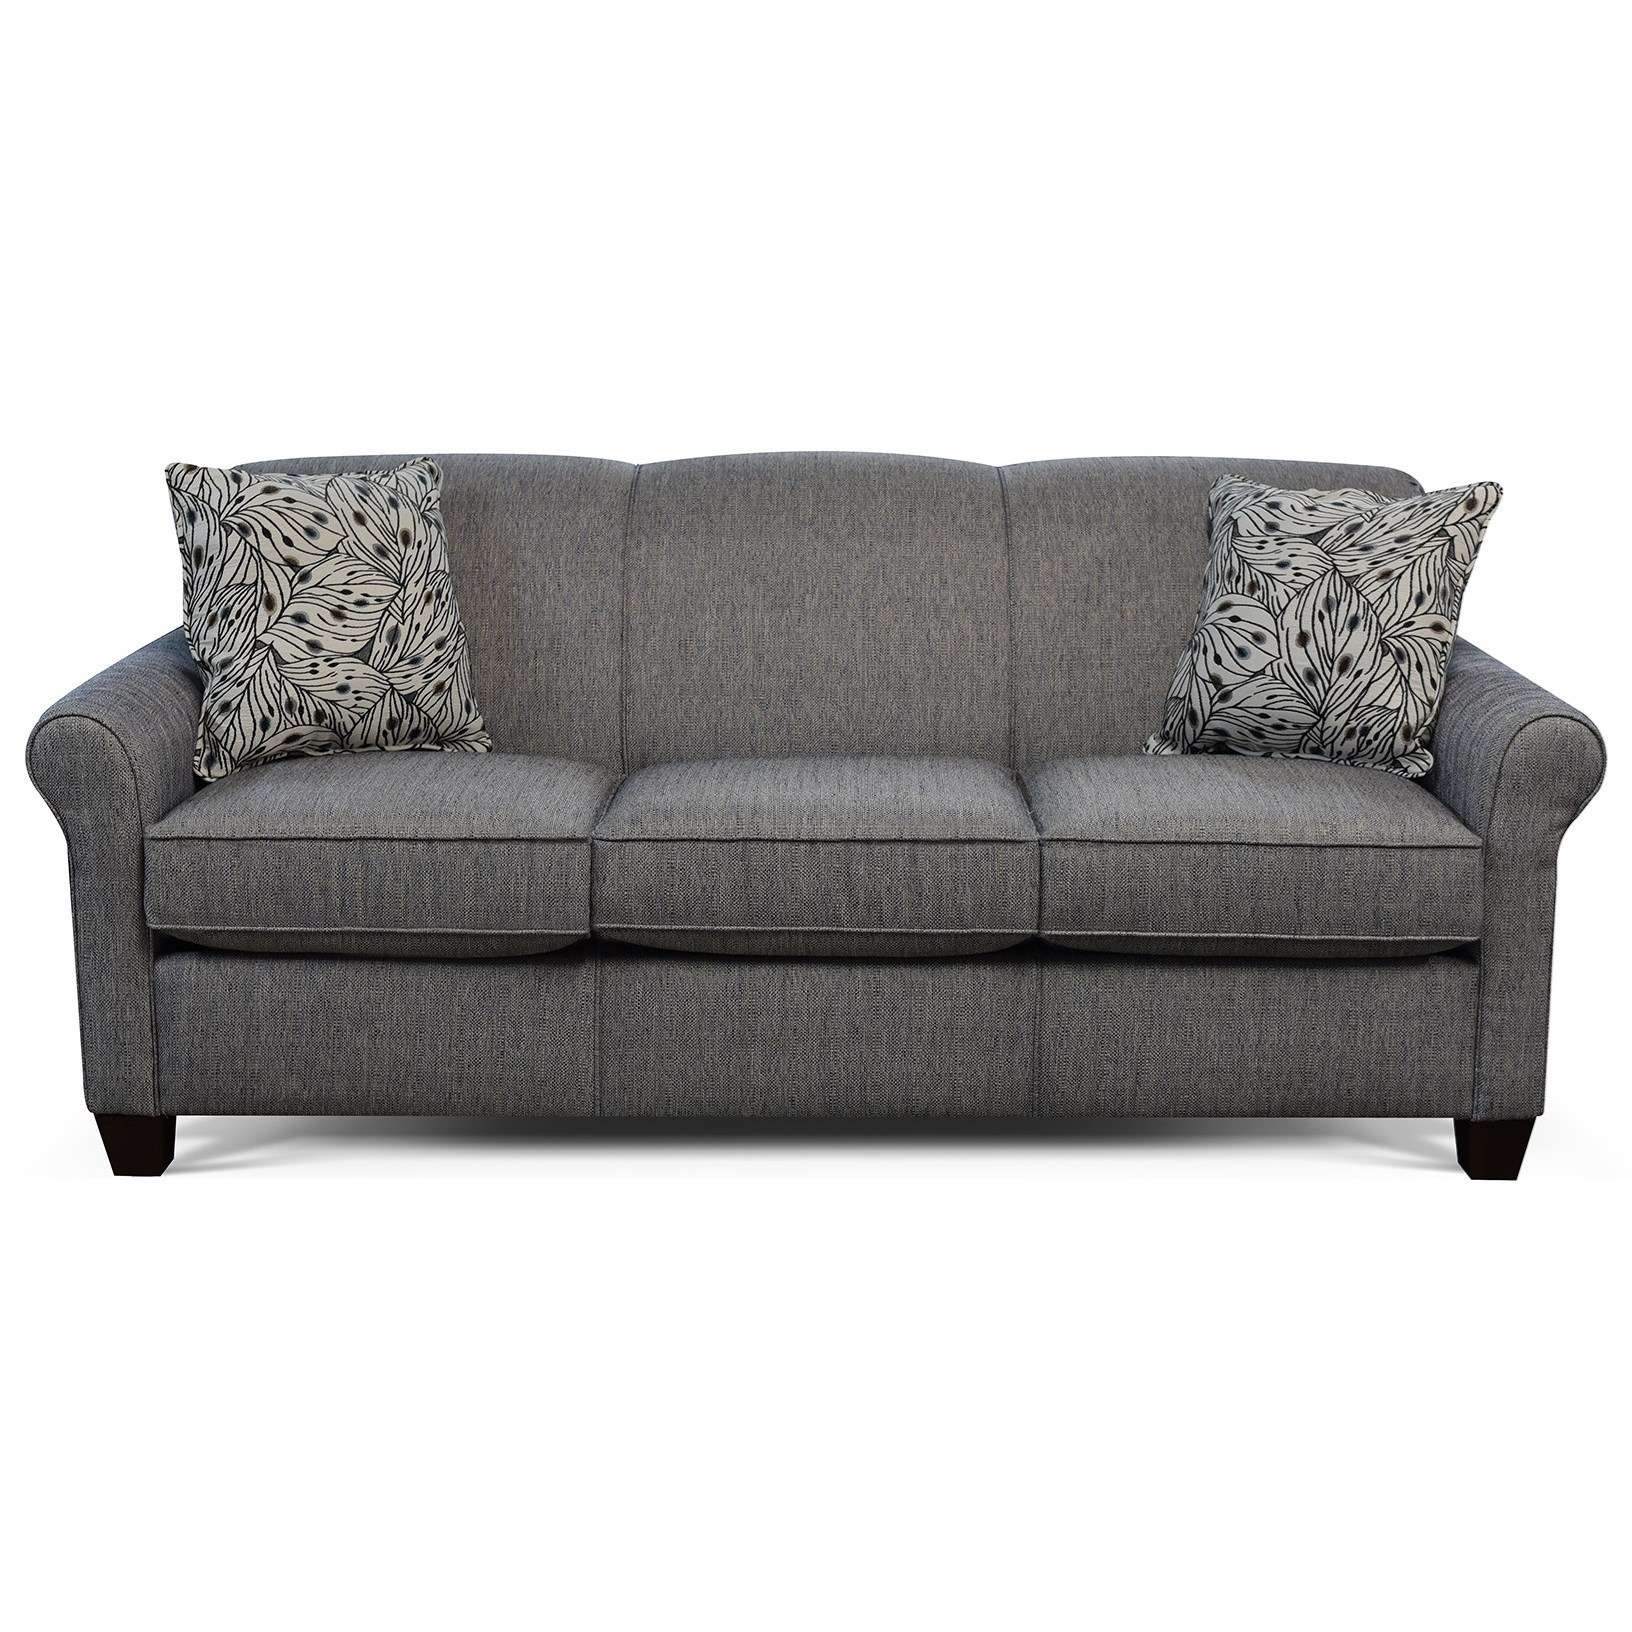 V460 Sofa by Alexvale at Turk Furniture